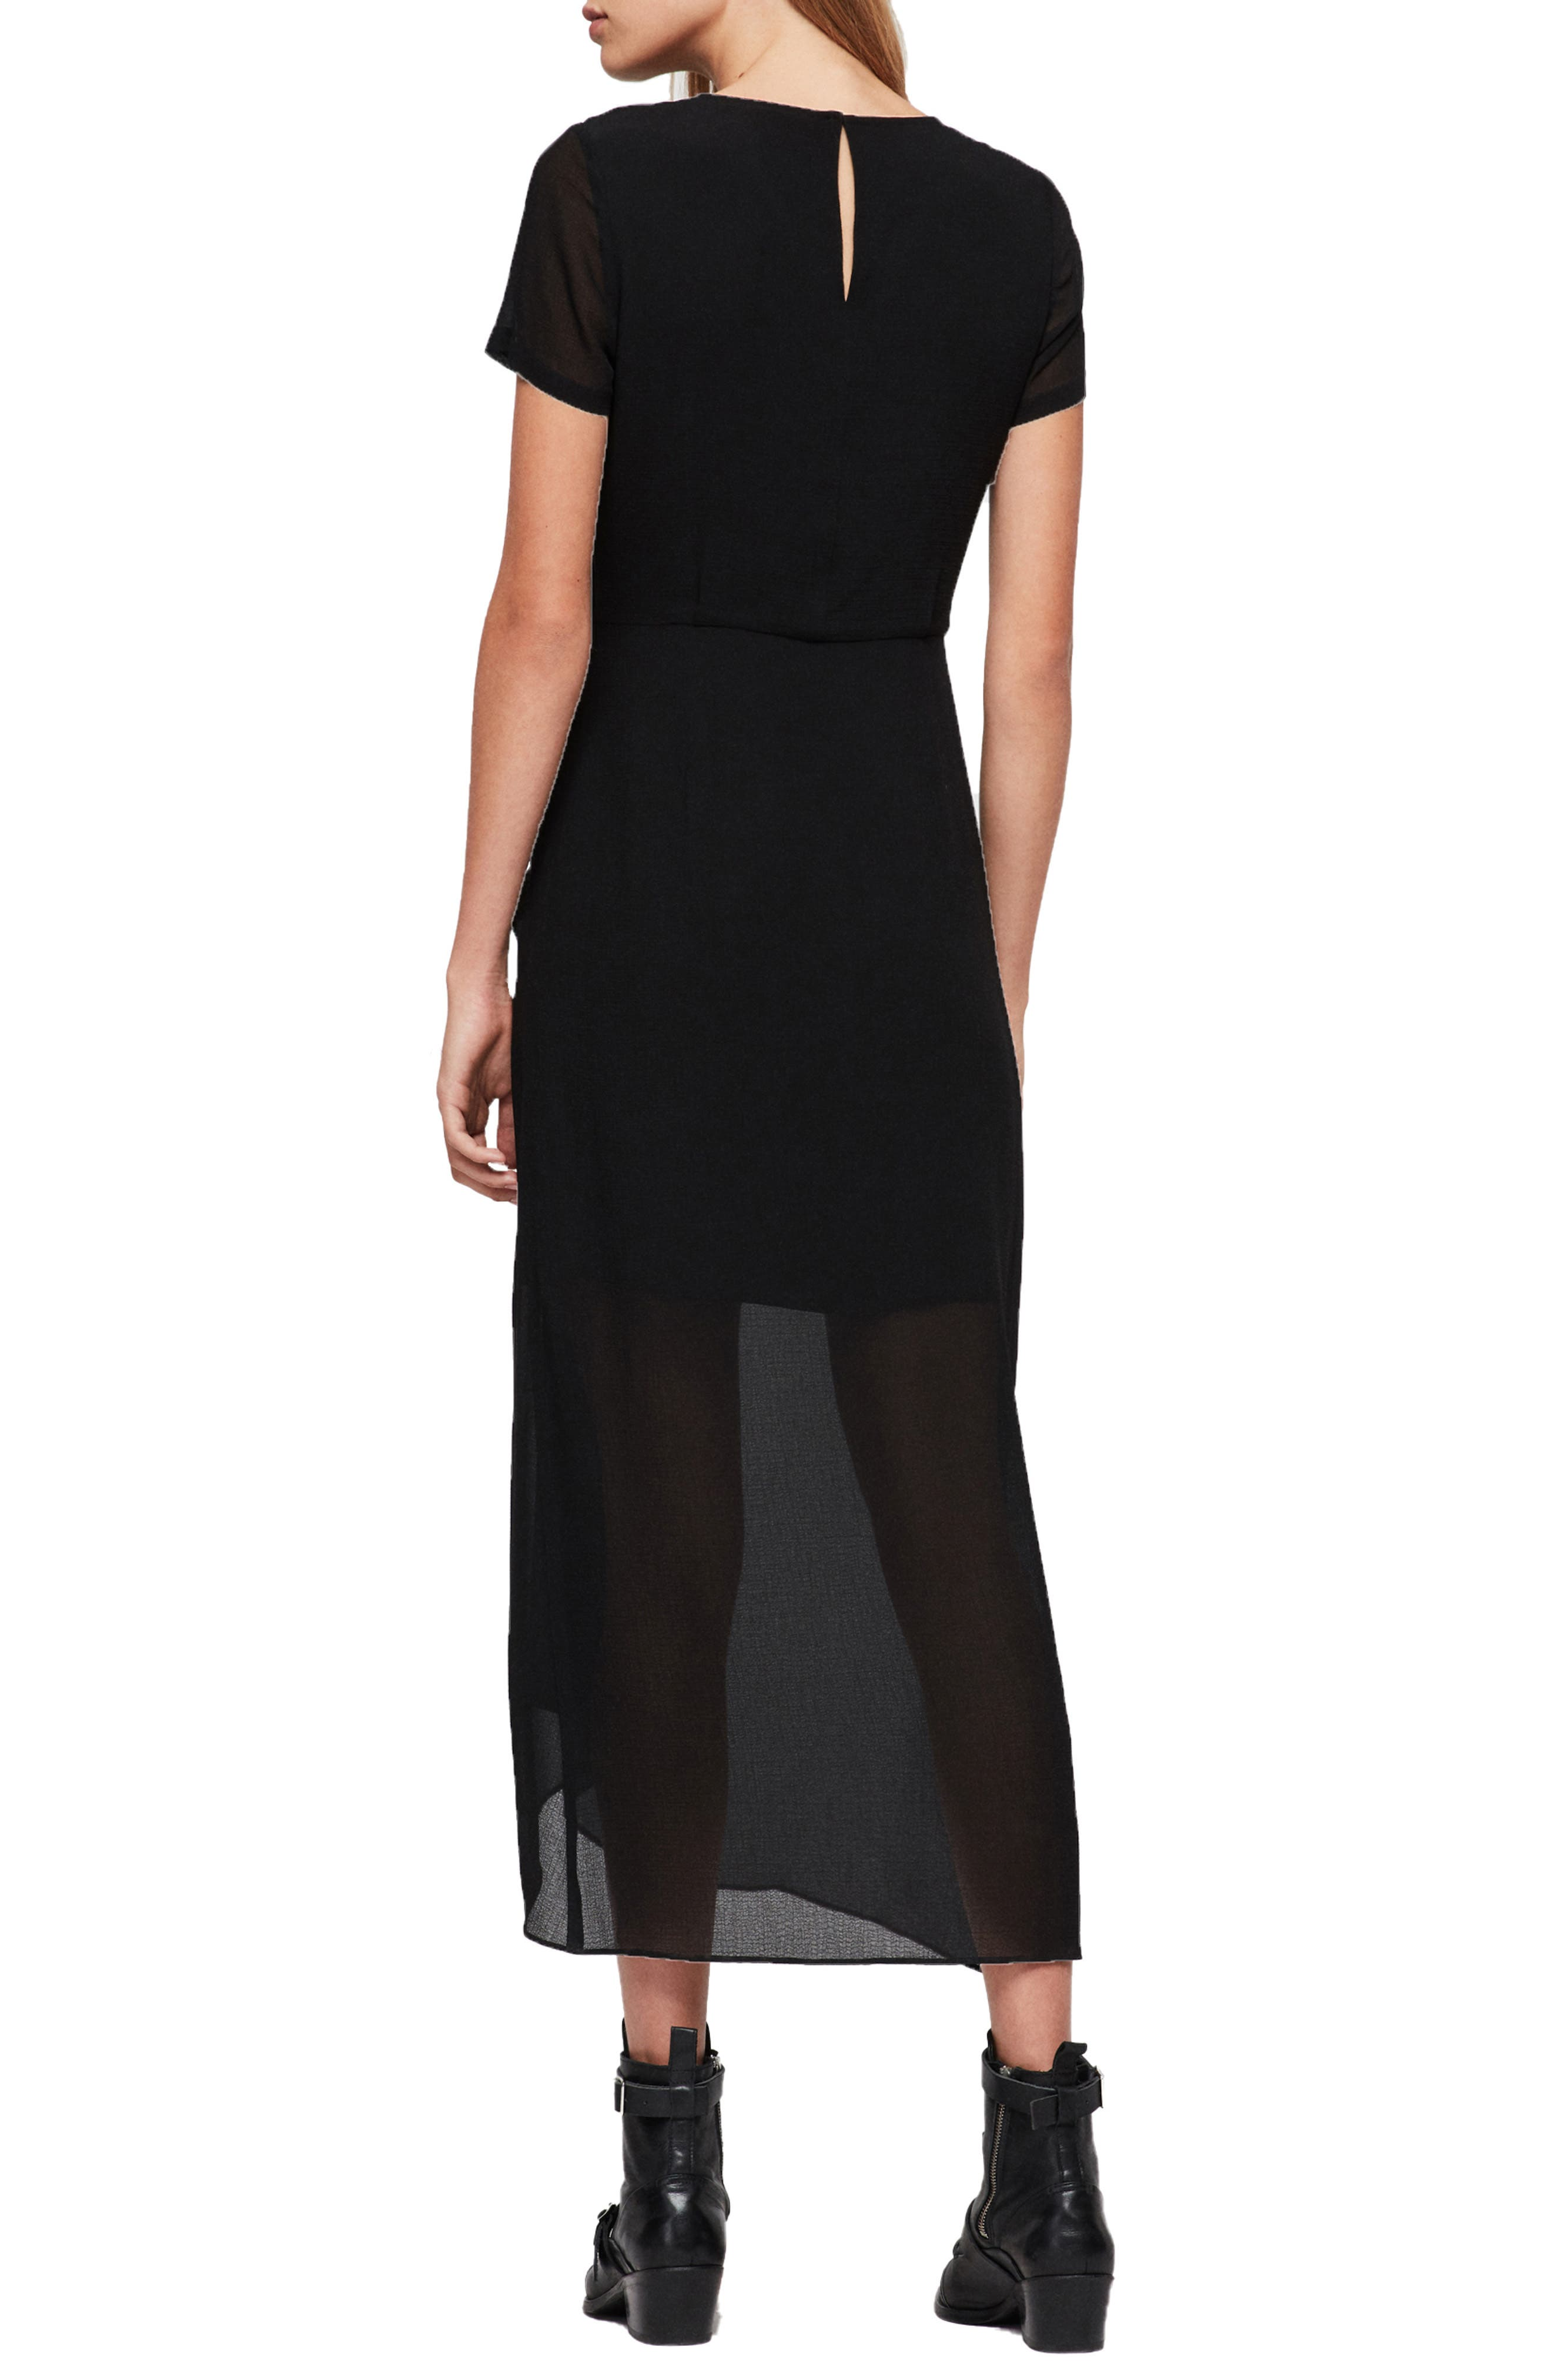 Ariya Dress,                             Alternate thumbnail 2, color,                             001